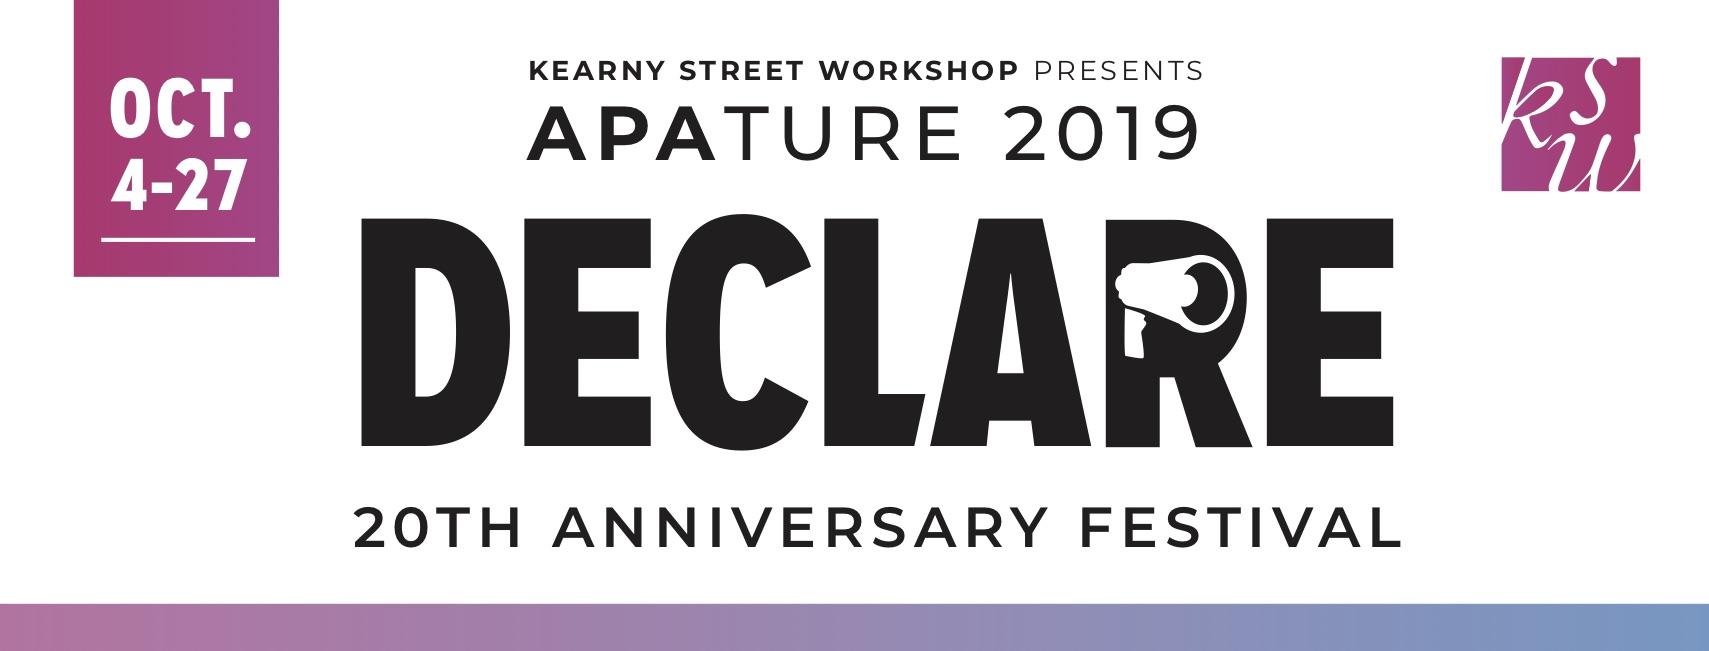 APAture_2019_Event_Showcases_v3.jpg